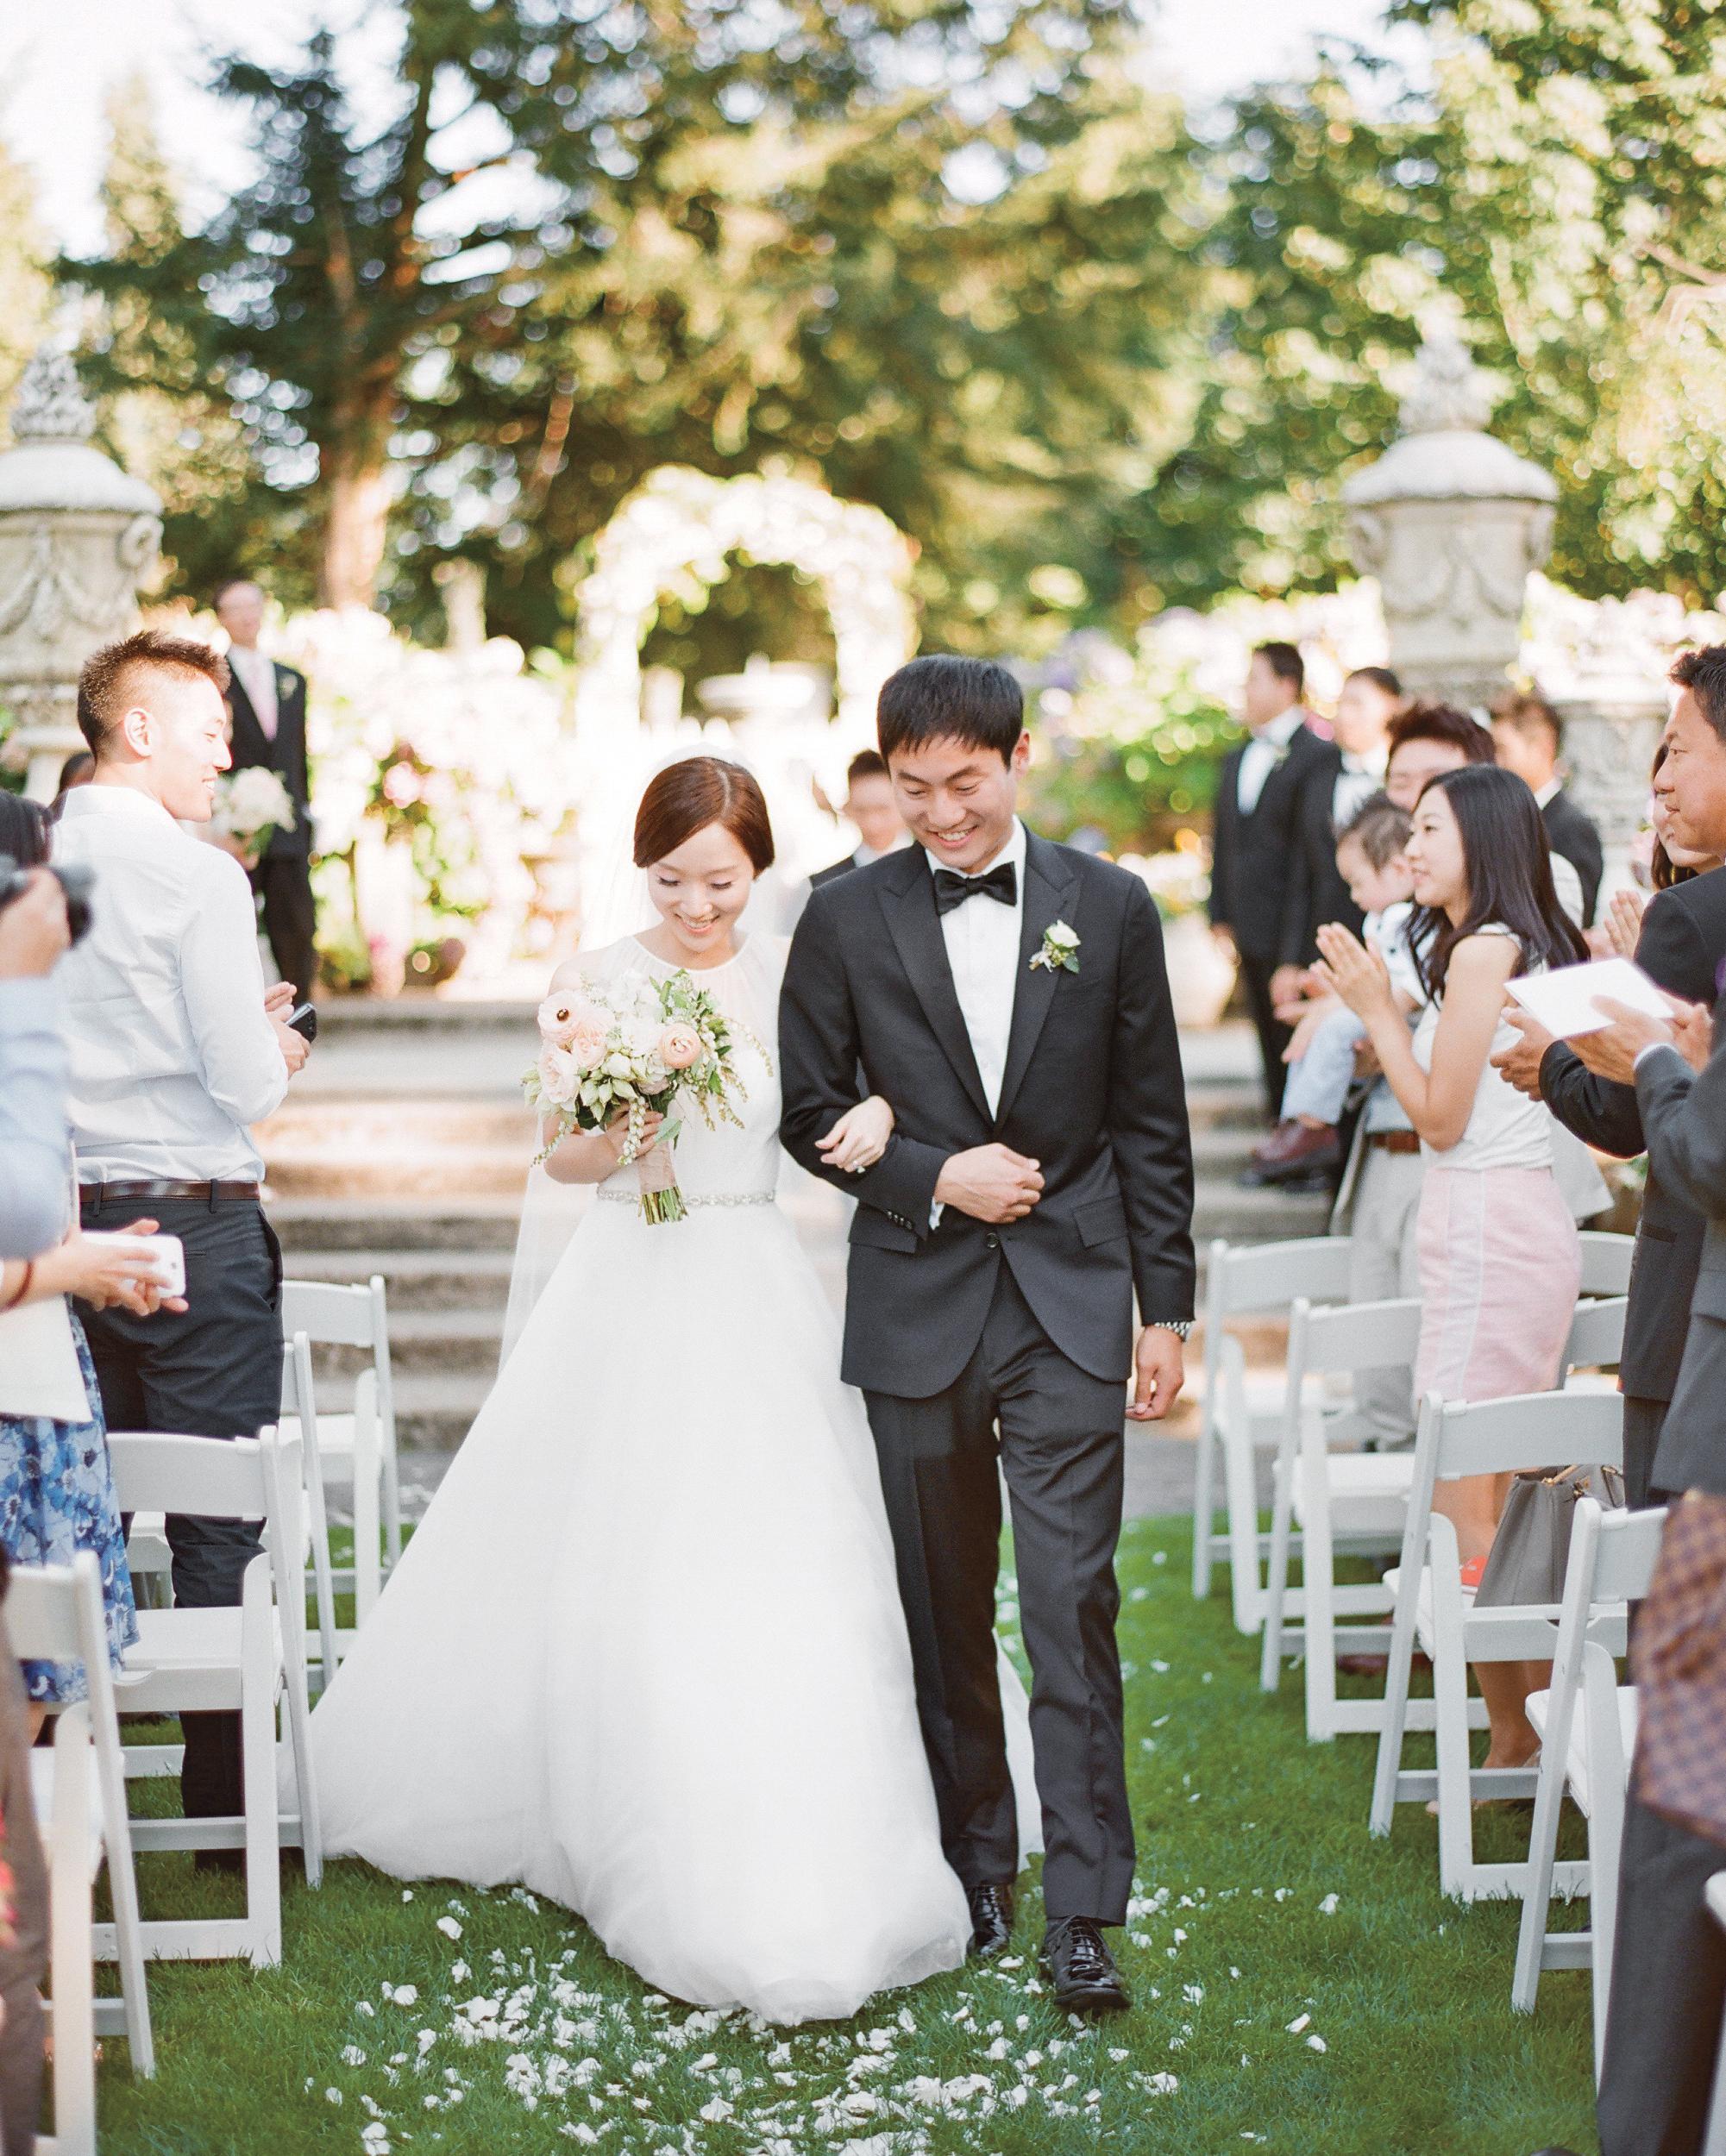 bride-groom-outdoors-aisle-2013-08-31-bomibilly-0449-mwds110832.jpg